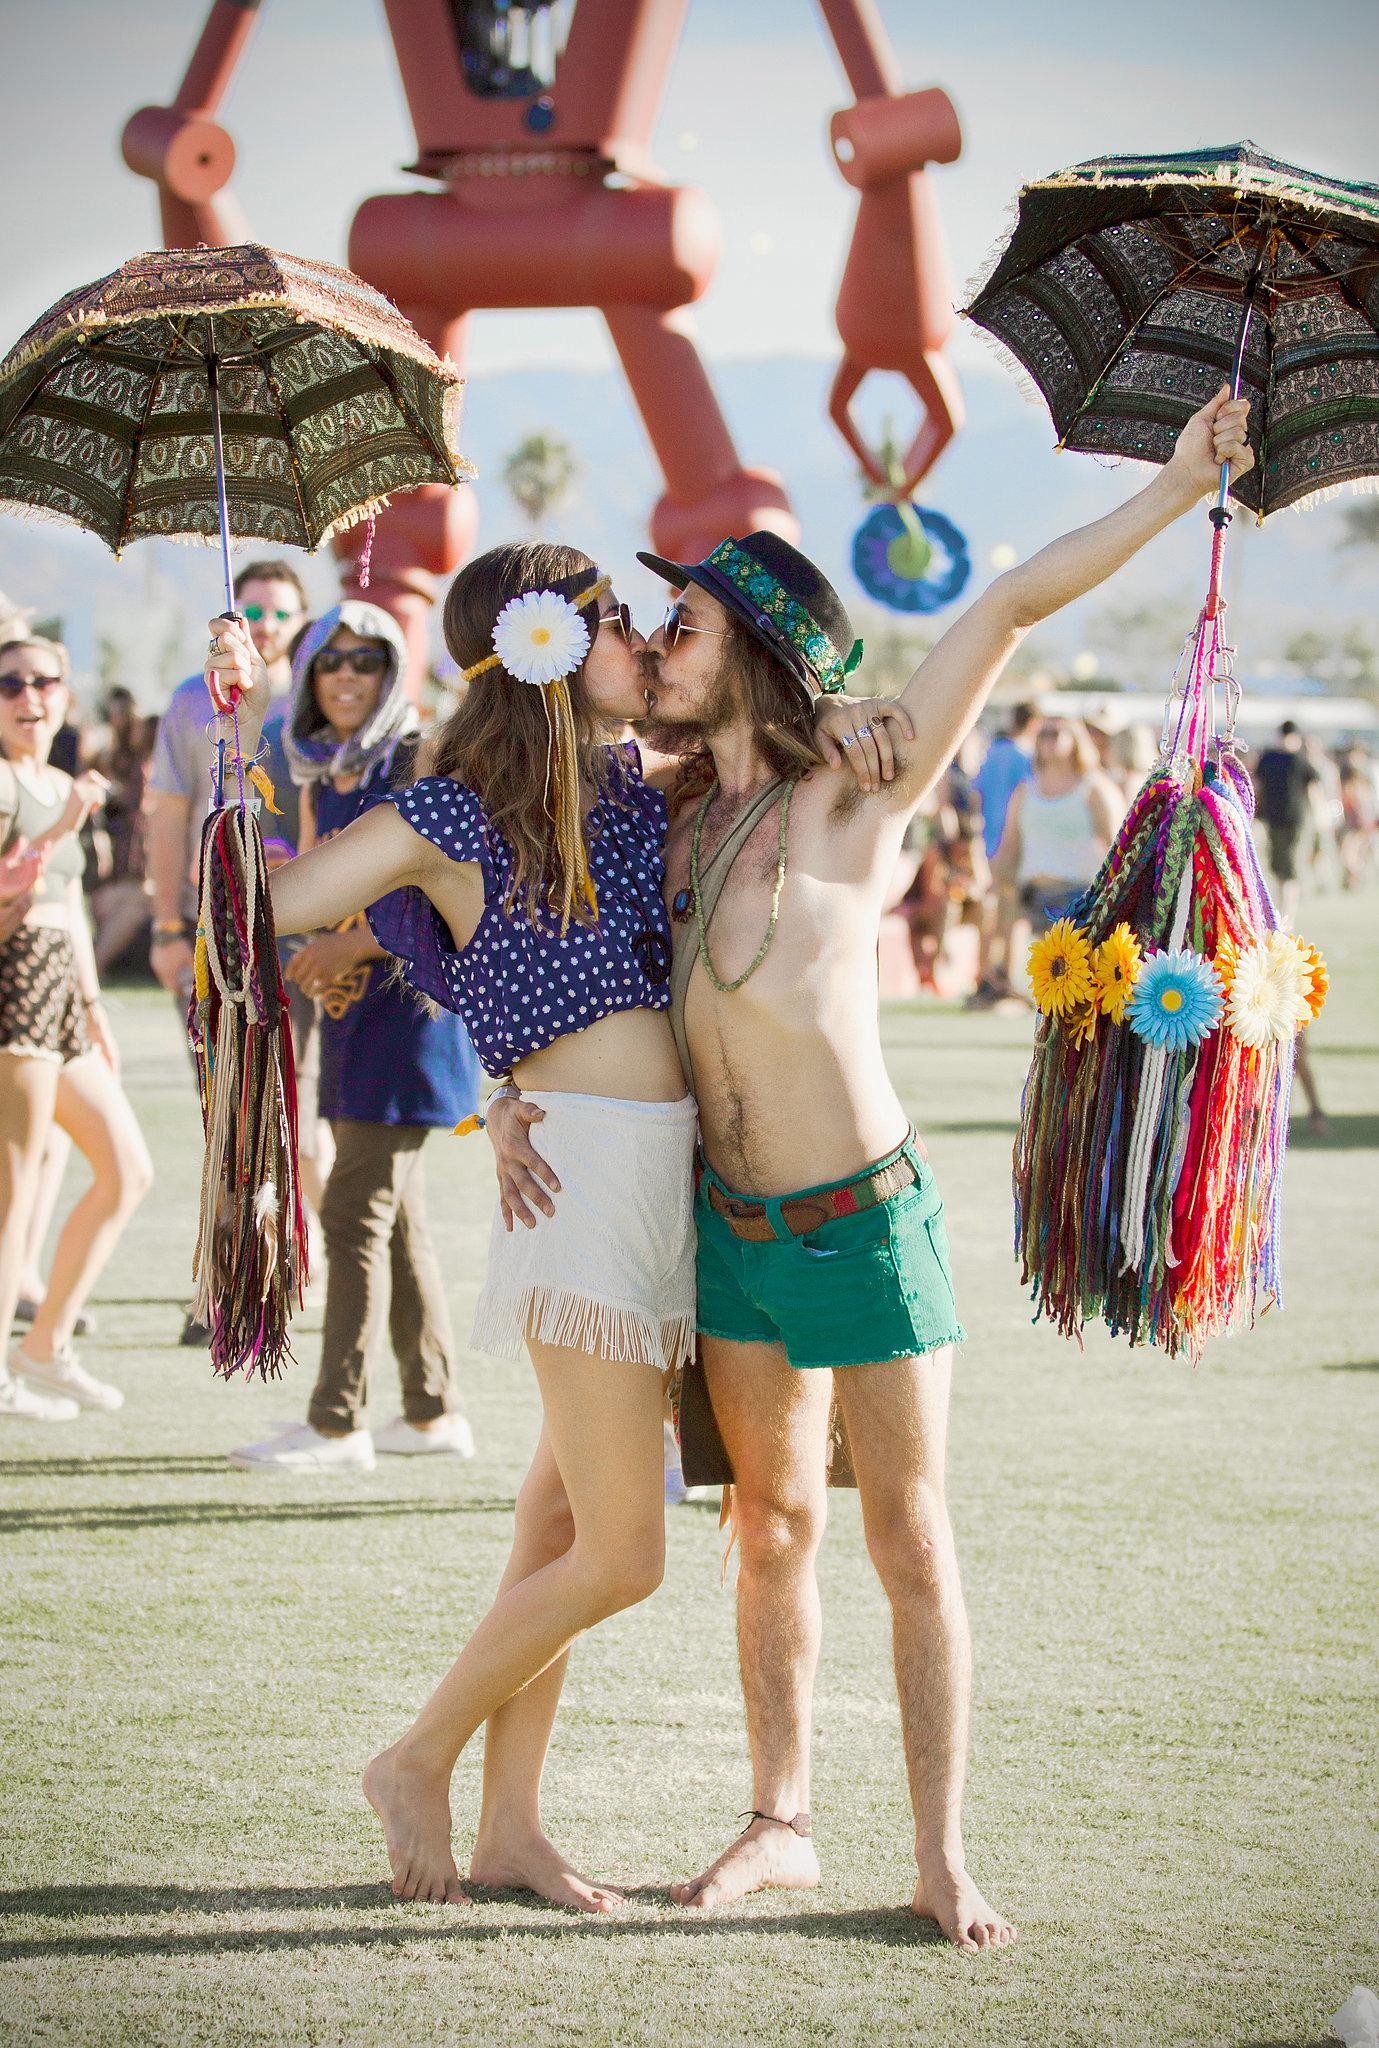 A Coachella couple kissed while holding umbrellas.